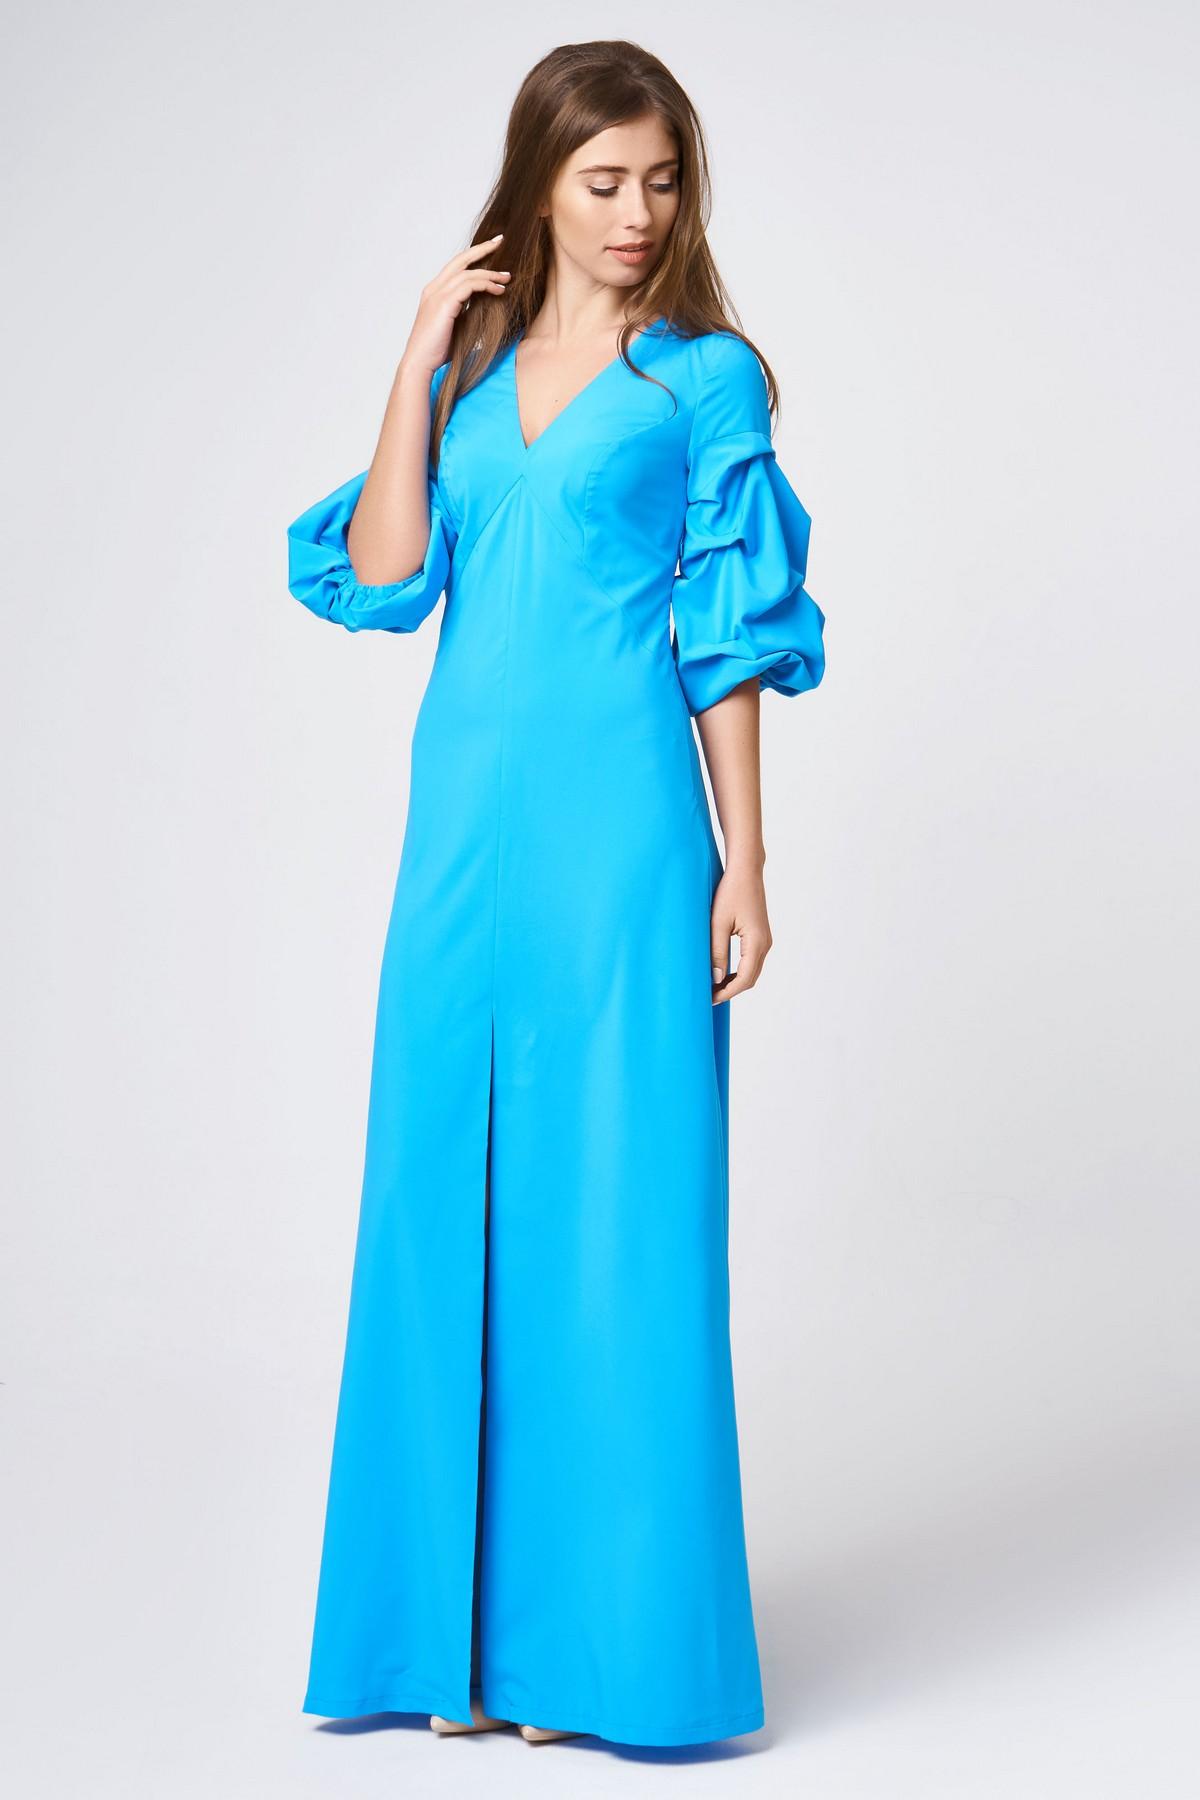 8dd0a538e7a Вечернее платье в пол с объемными рукавами